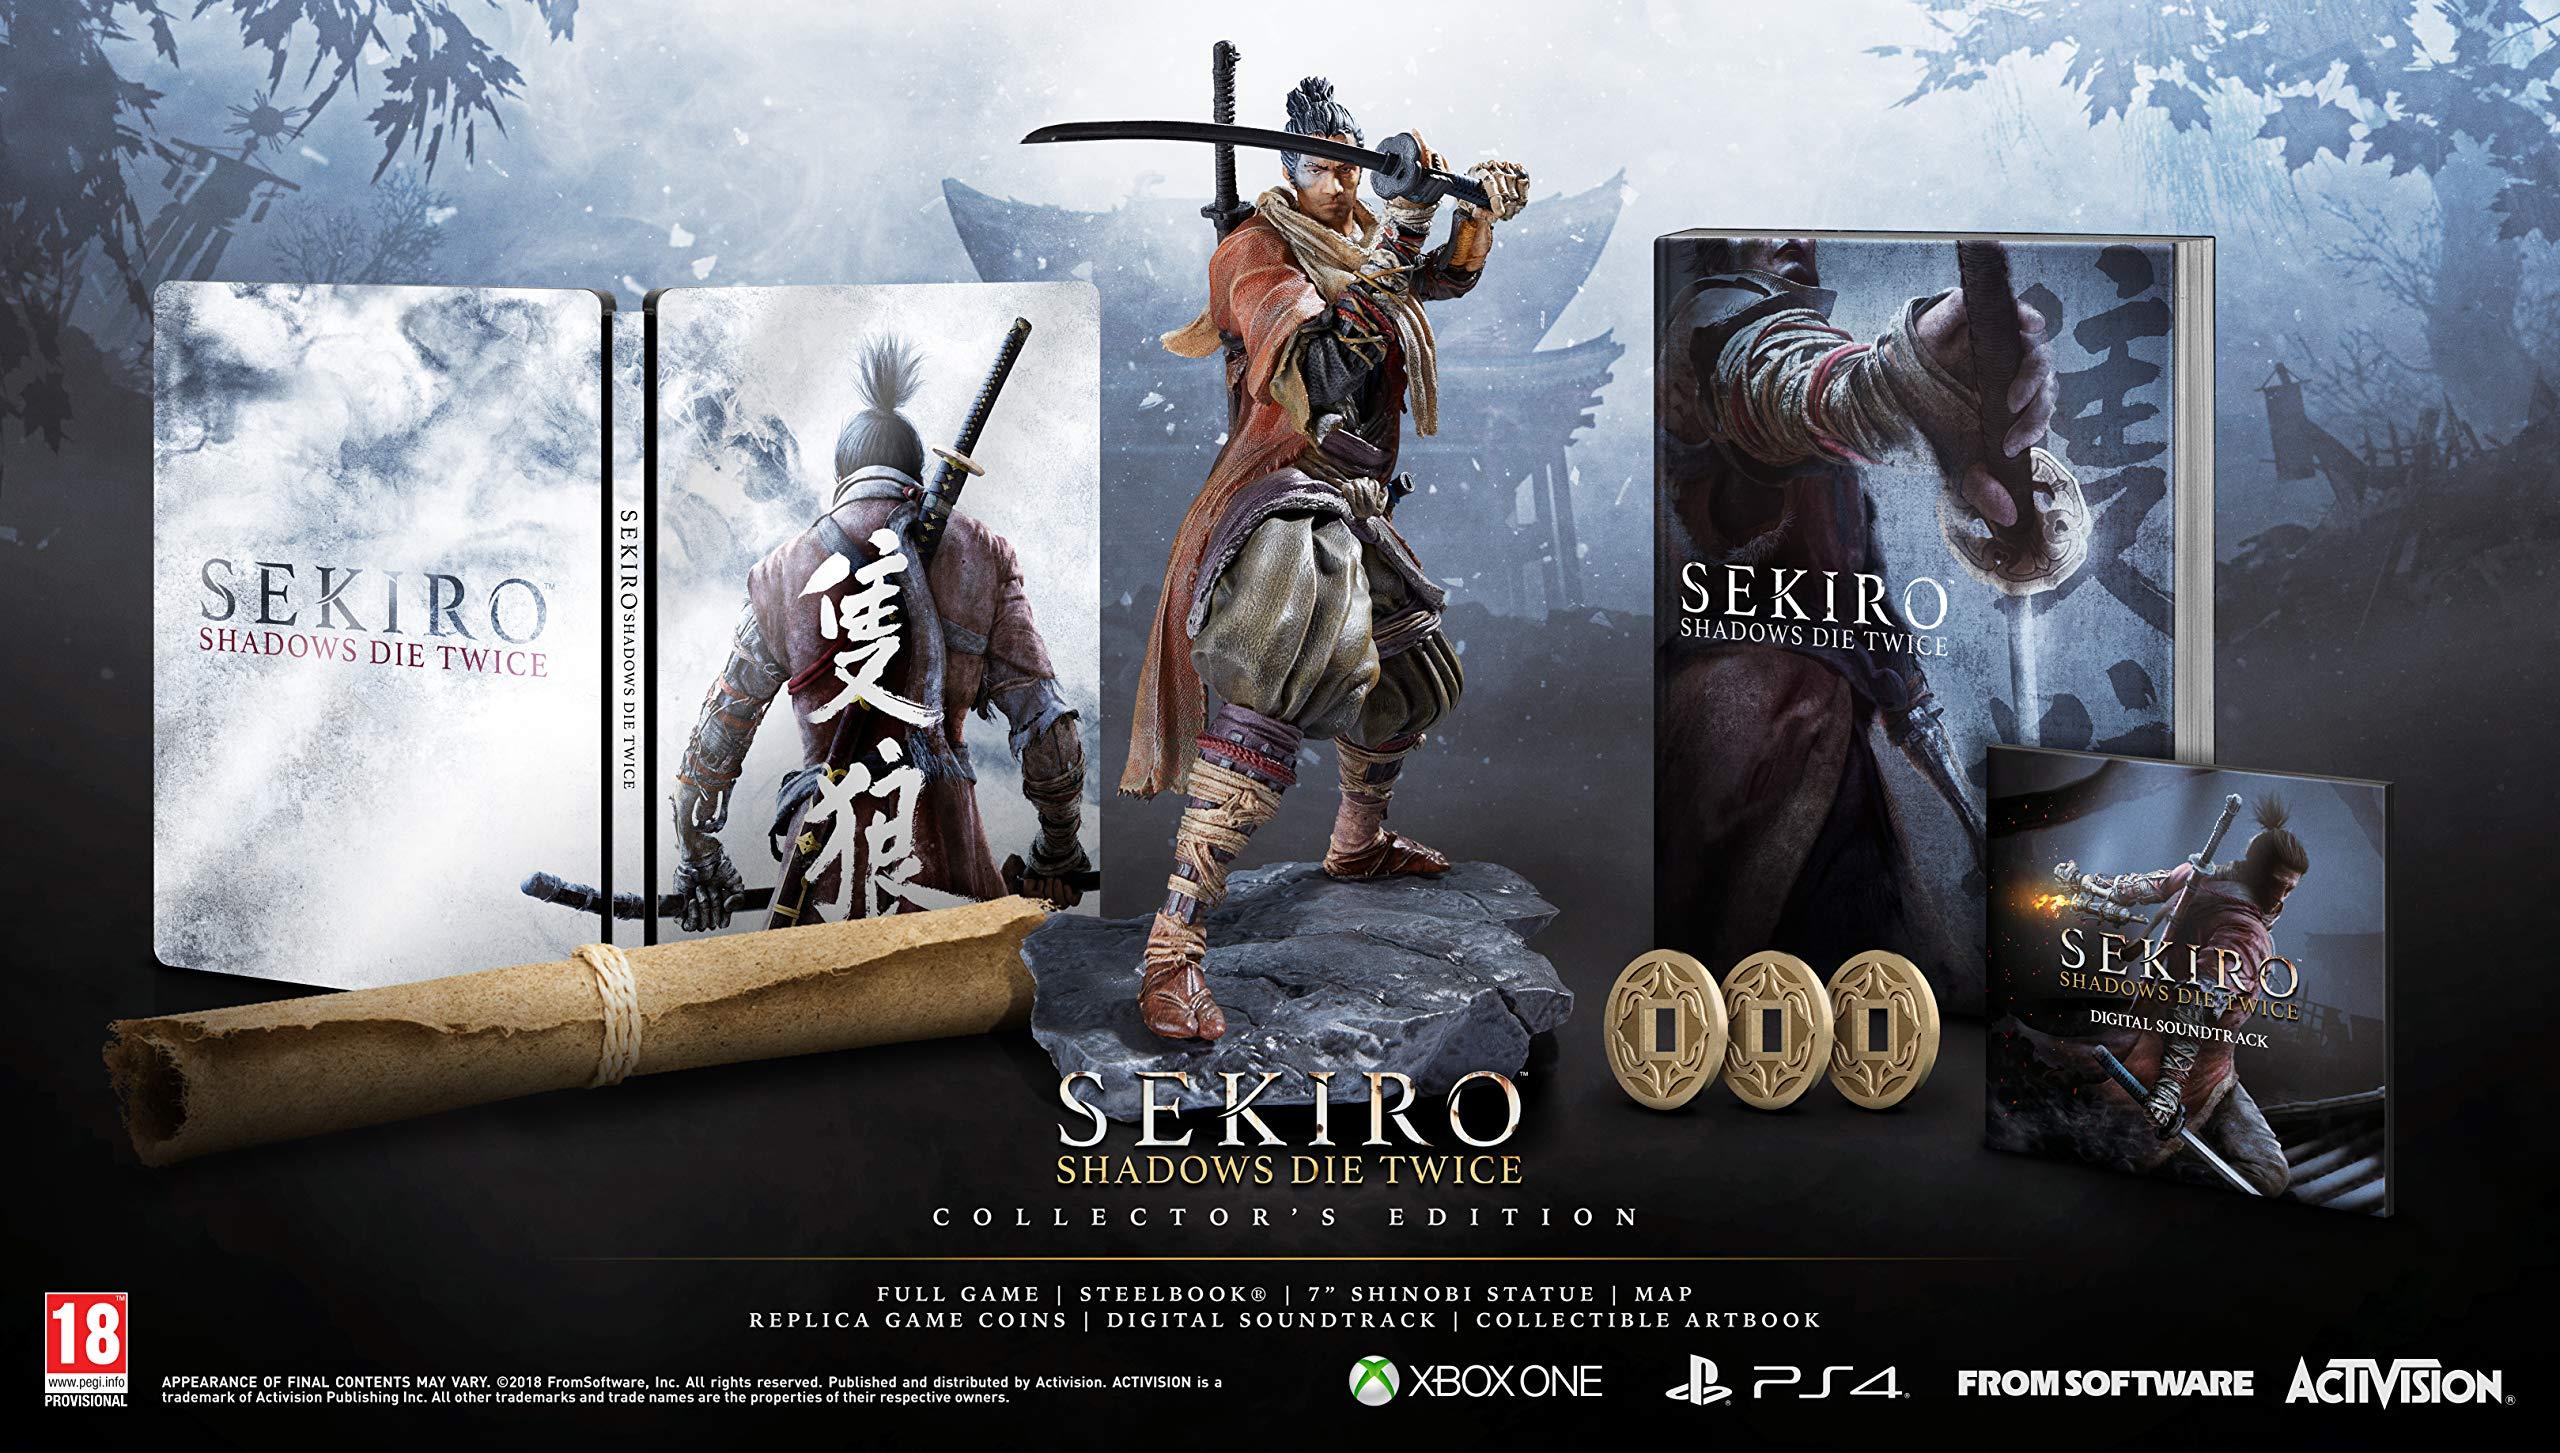 Sekiro Shadows Die Twice Collector's Edition (Xbox One)